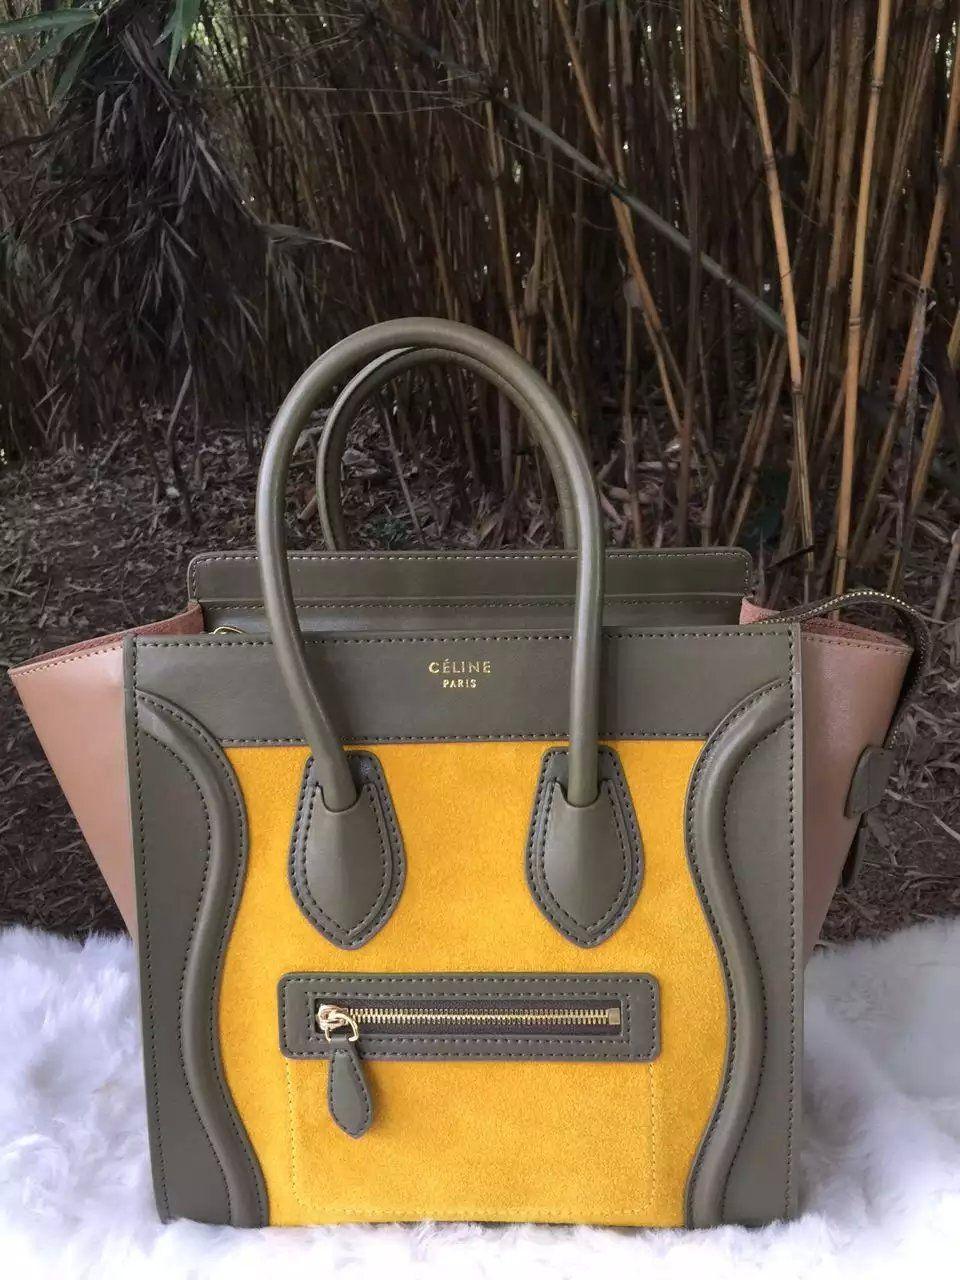 New Arrival 2016 Celine Bags Outlet-Celine Micro Luggage Handbag in  Multi-color Calfskin C0406-KYT 8a4a458a885b1